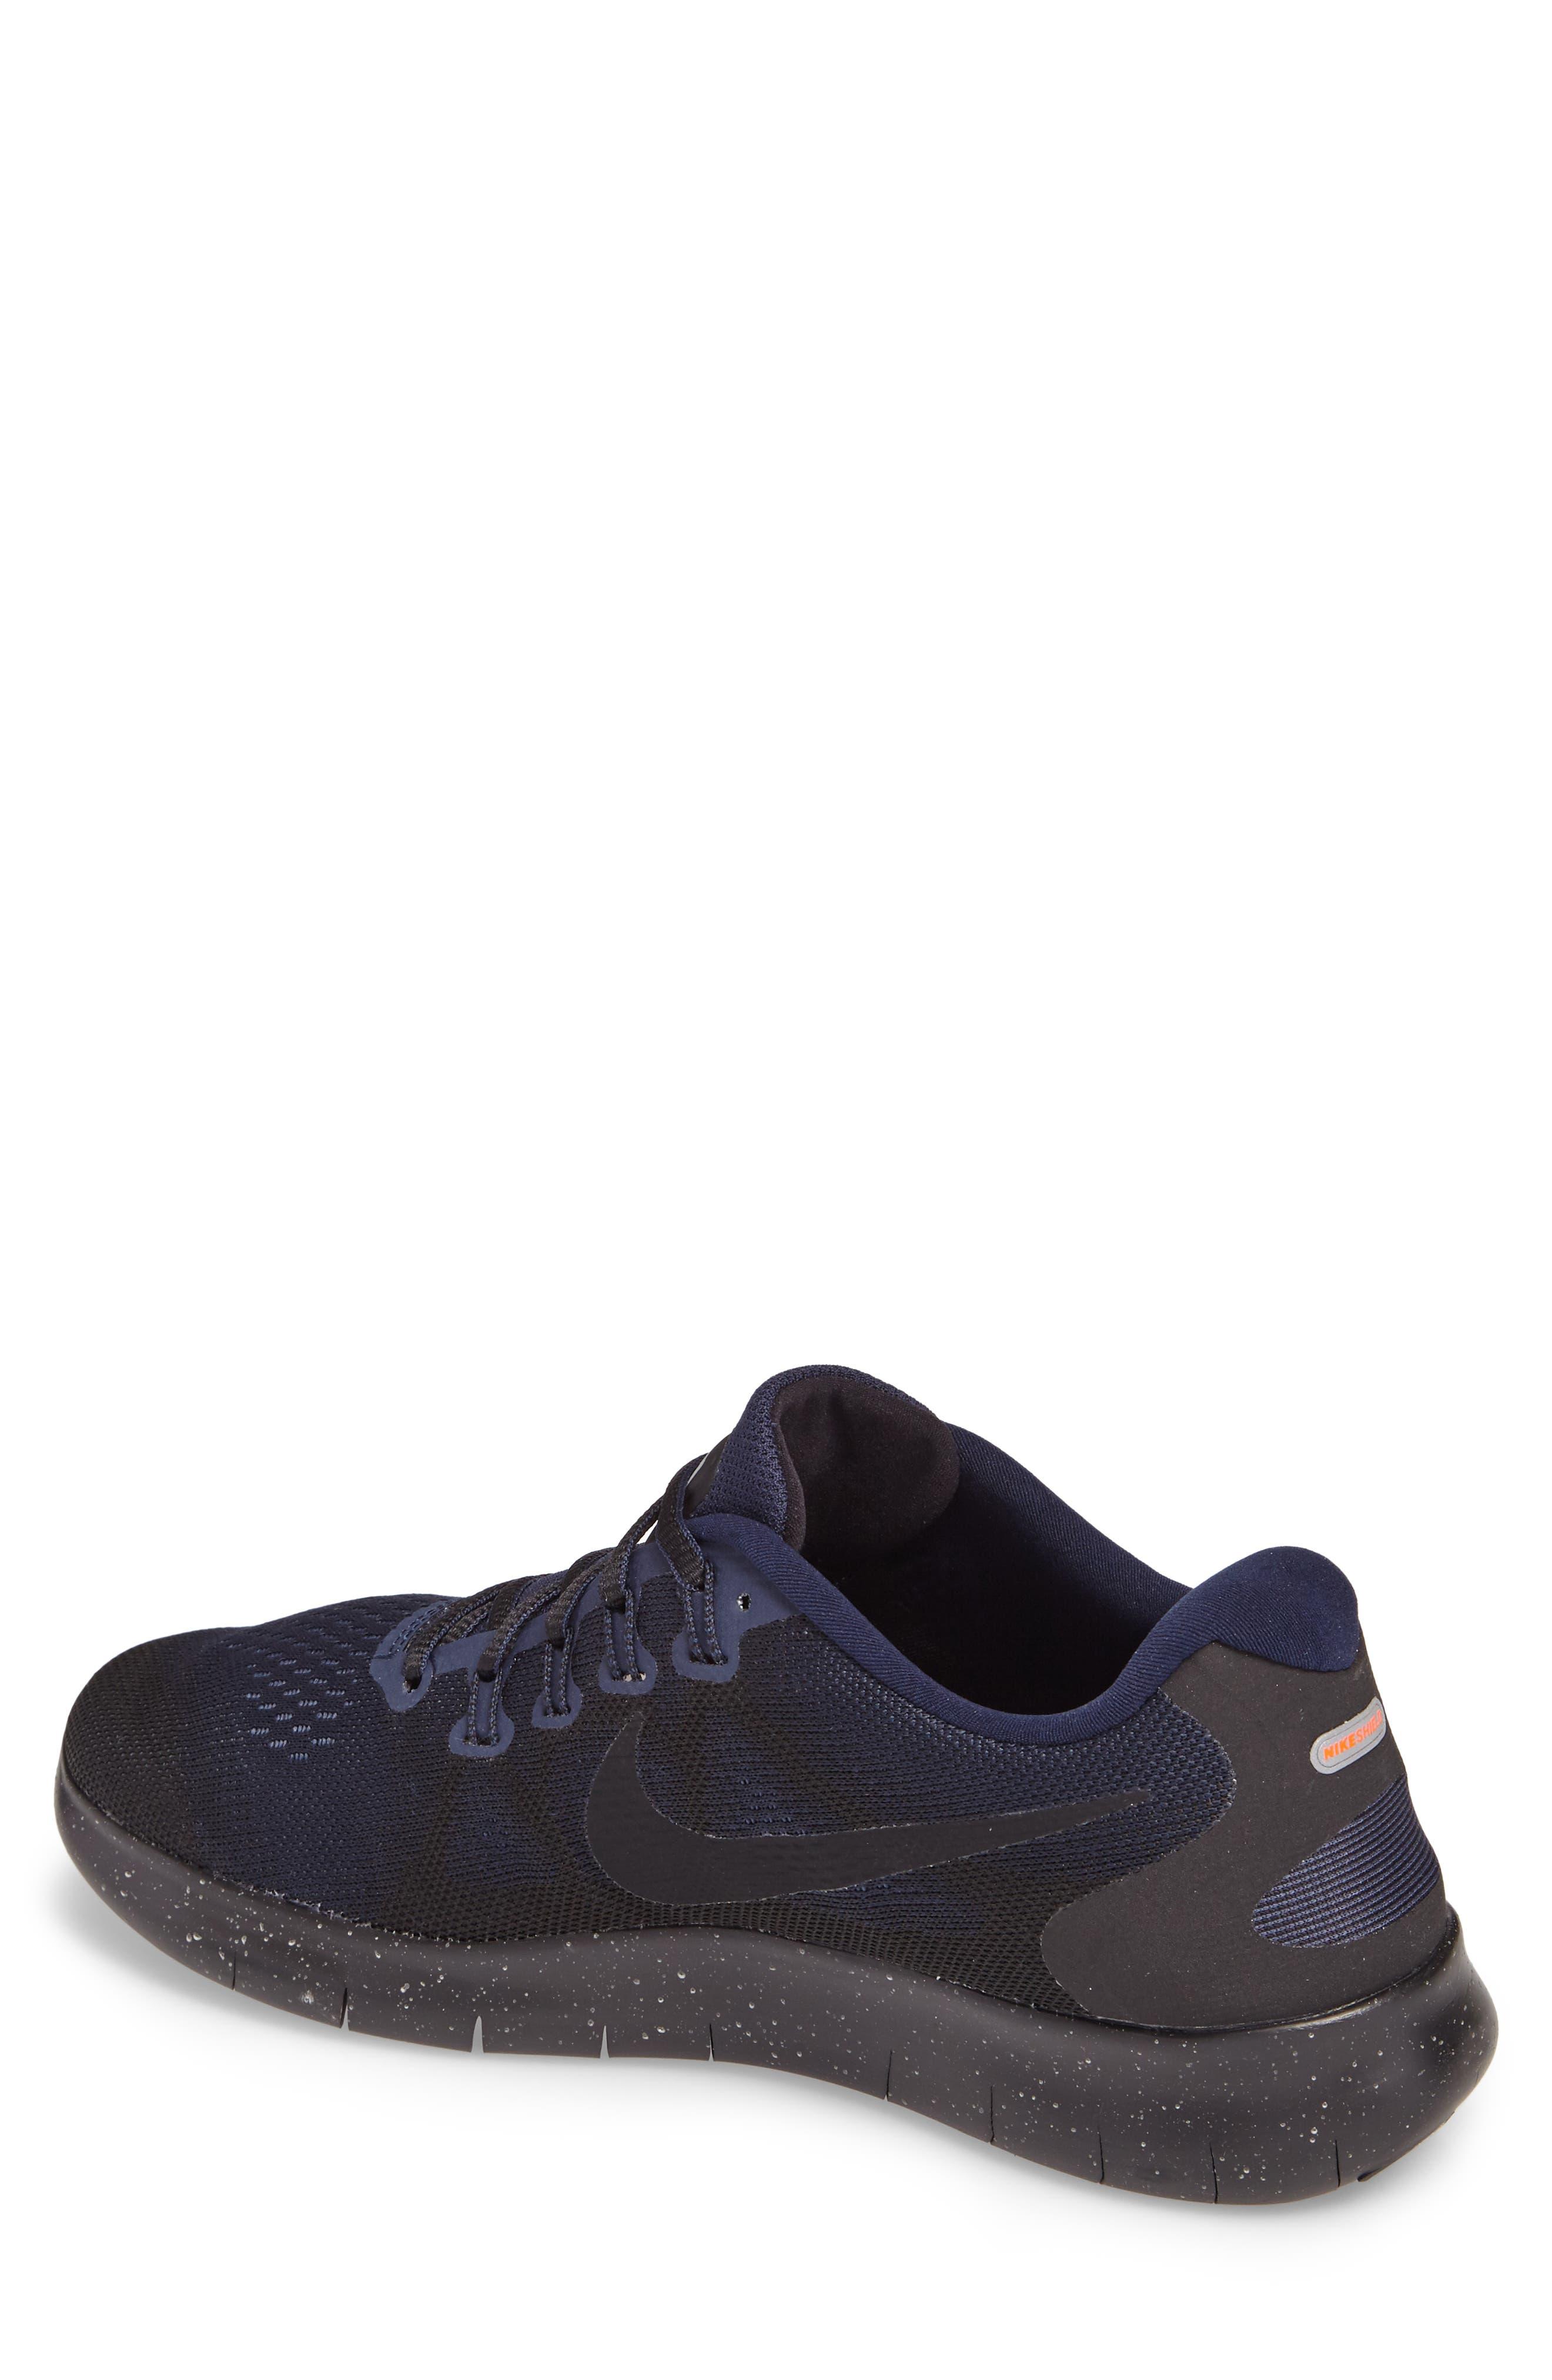 Alternate Image 2  - Nike Free RN 2017 Shield Water-Repellent Training Shoe (Men)